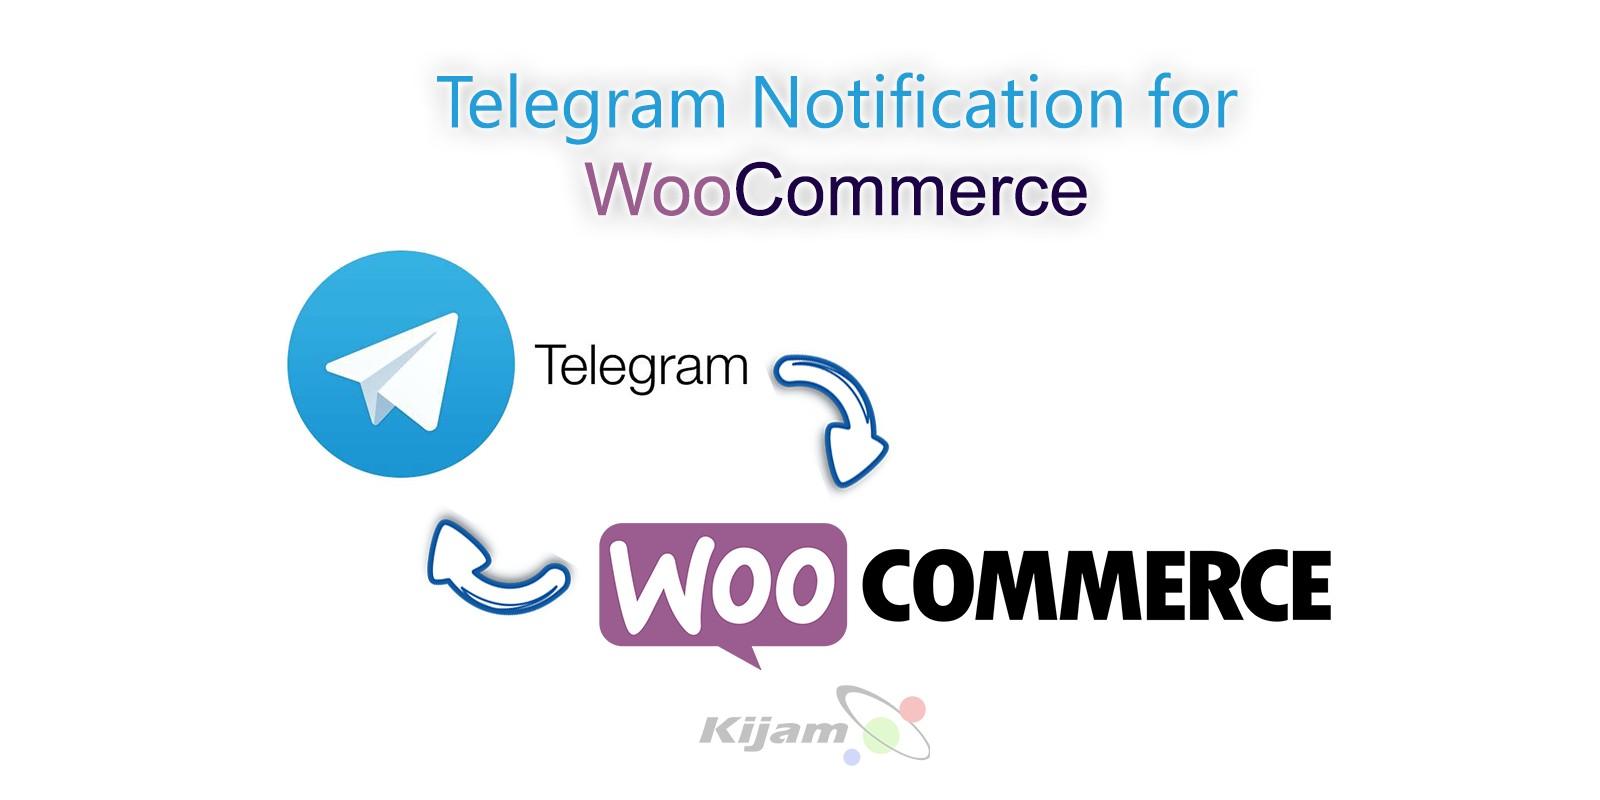 Telegram Notification For WooCommerce